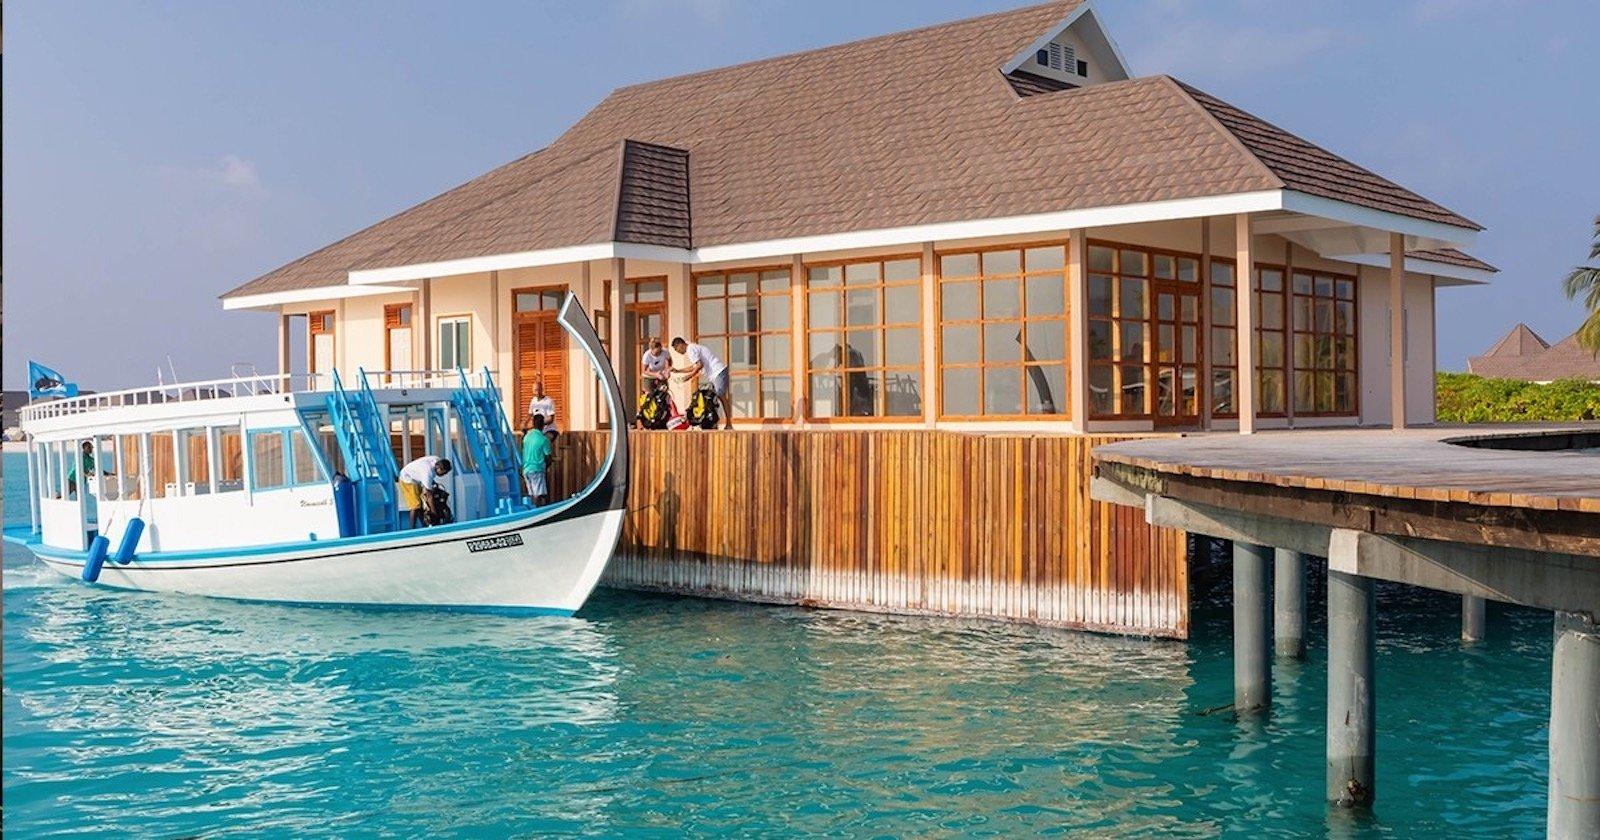 Boats of the Maldives